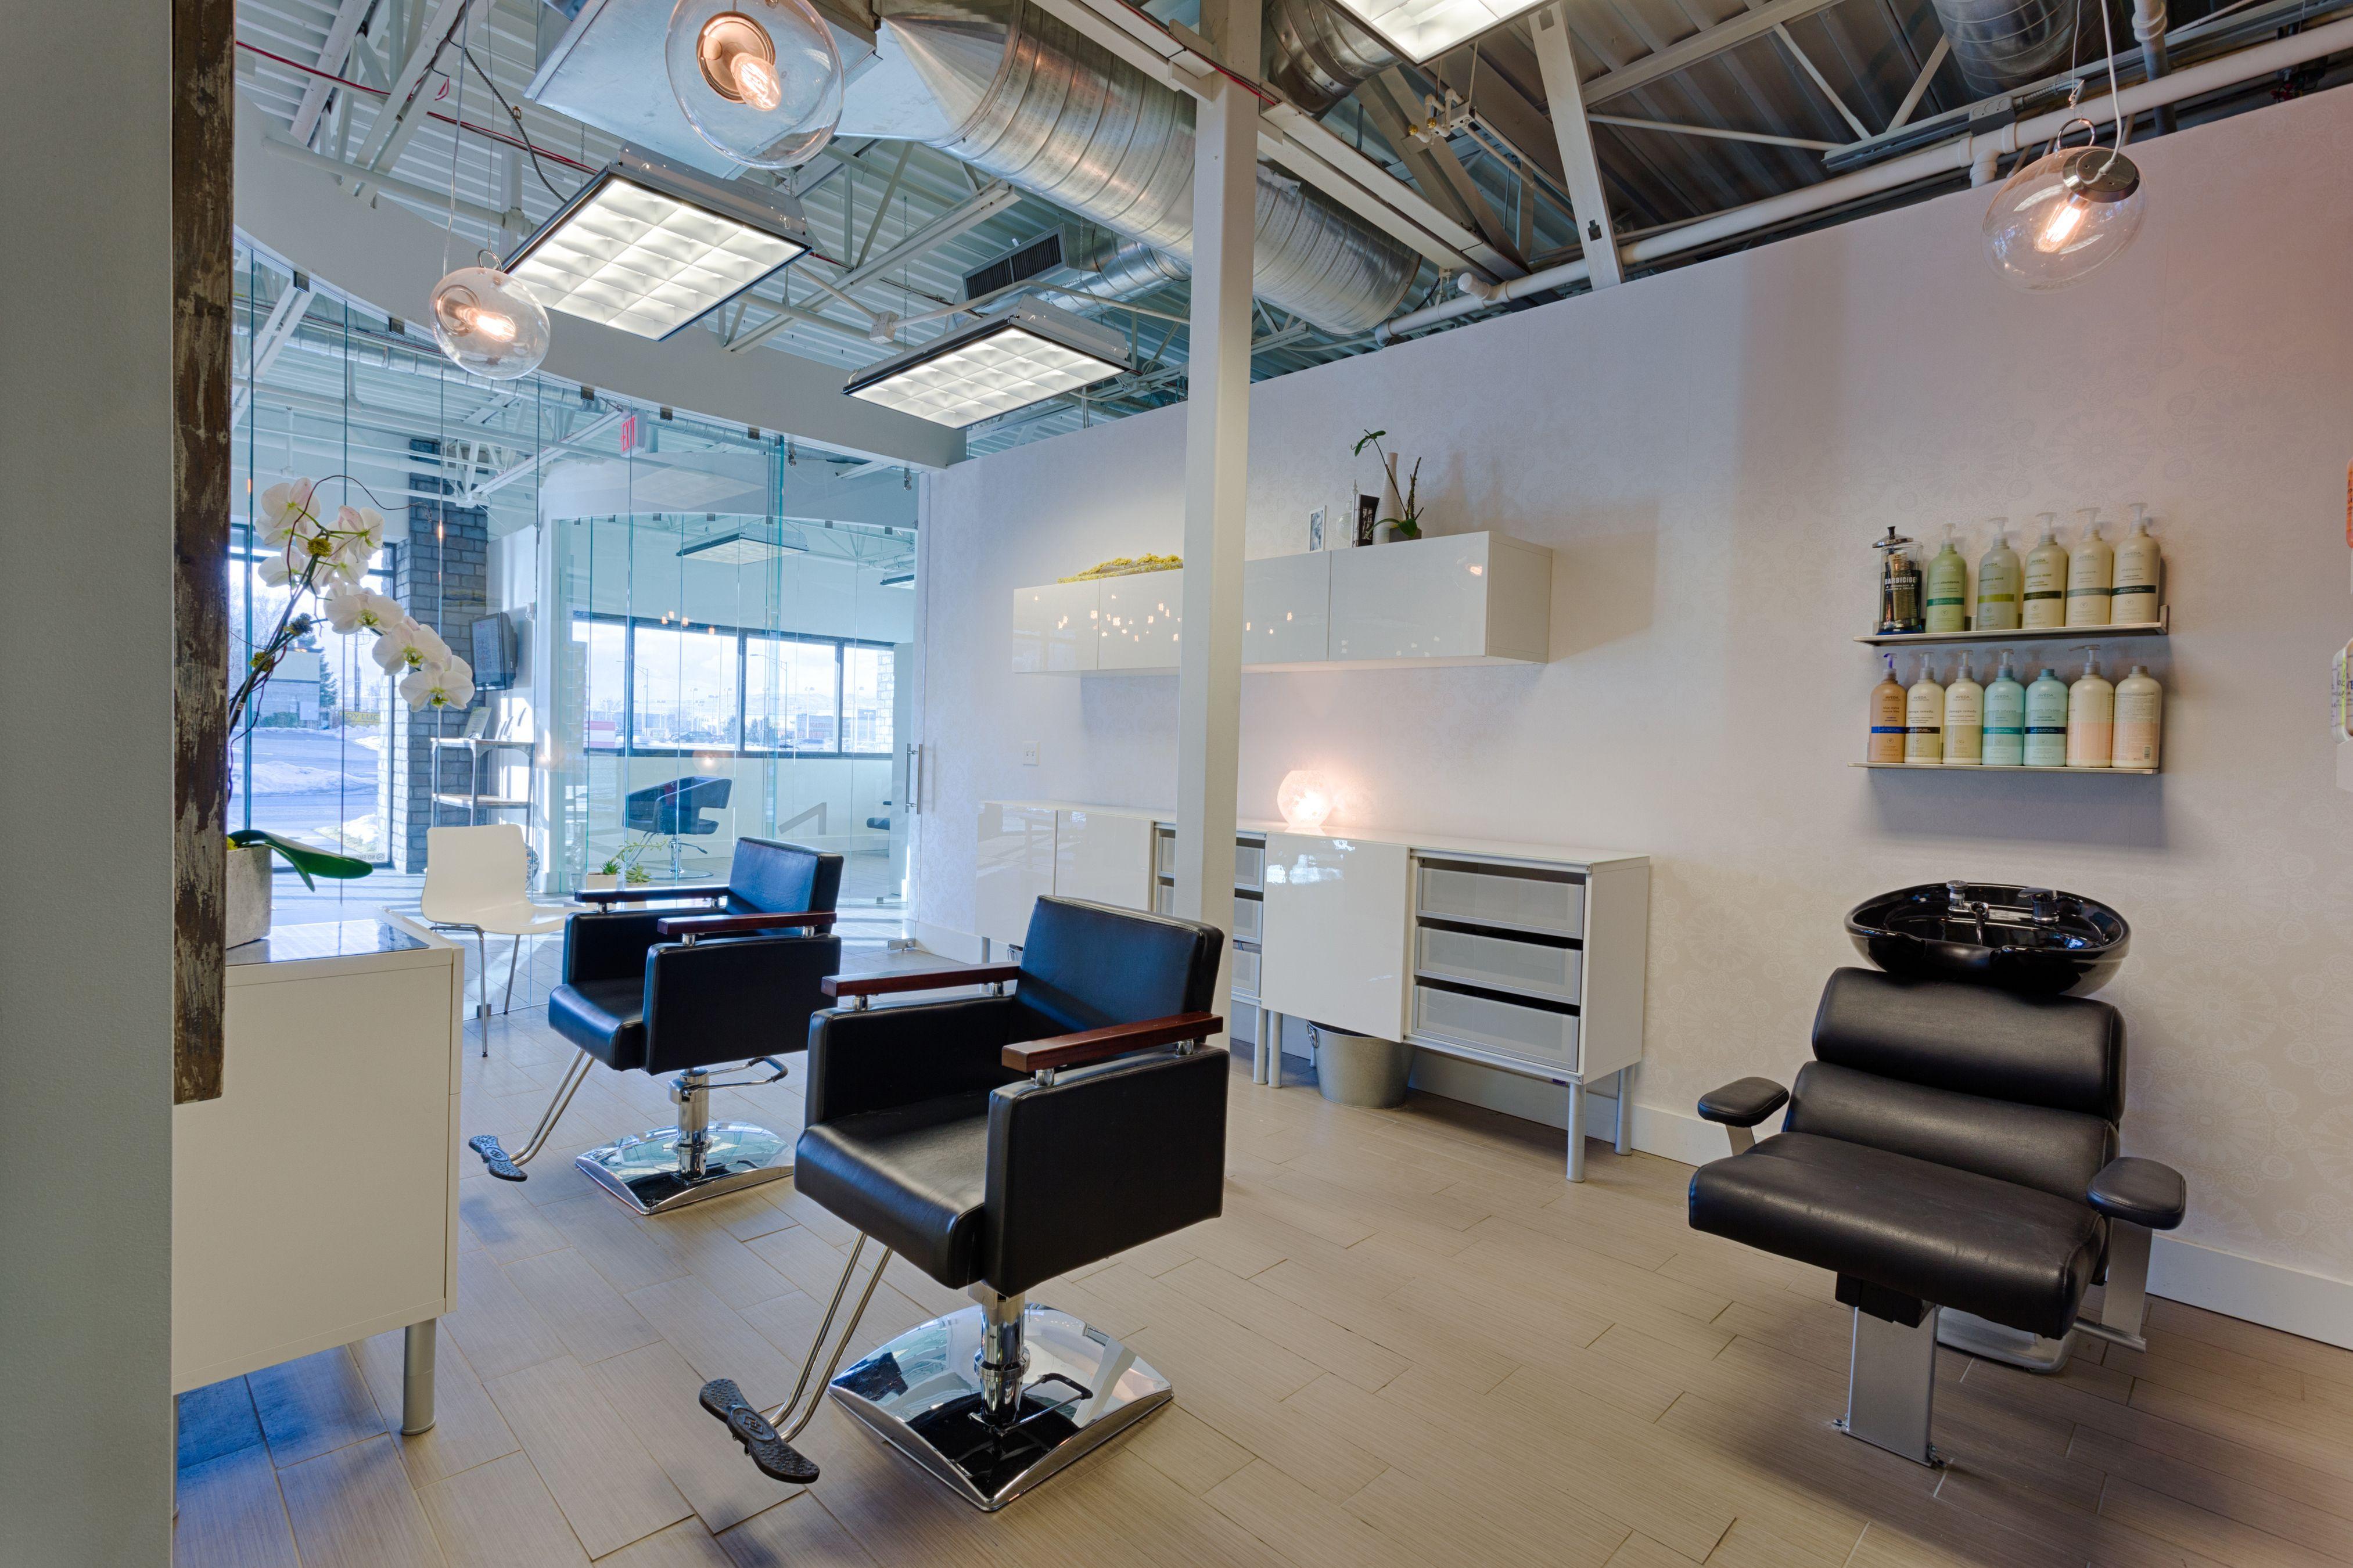 Great studio size...2 stations & 1 shampoo unit.......Image Studios Sandy, Utah Studio 117 #imagestudios